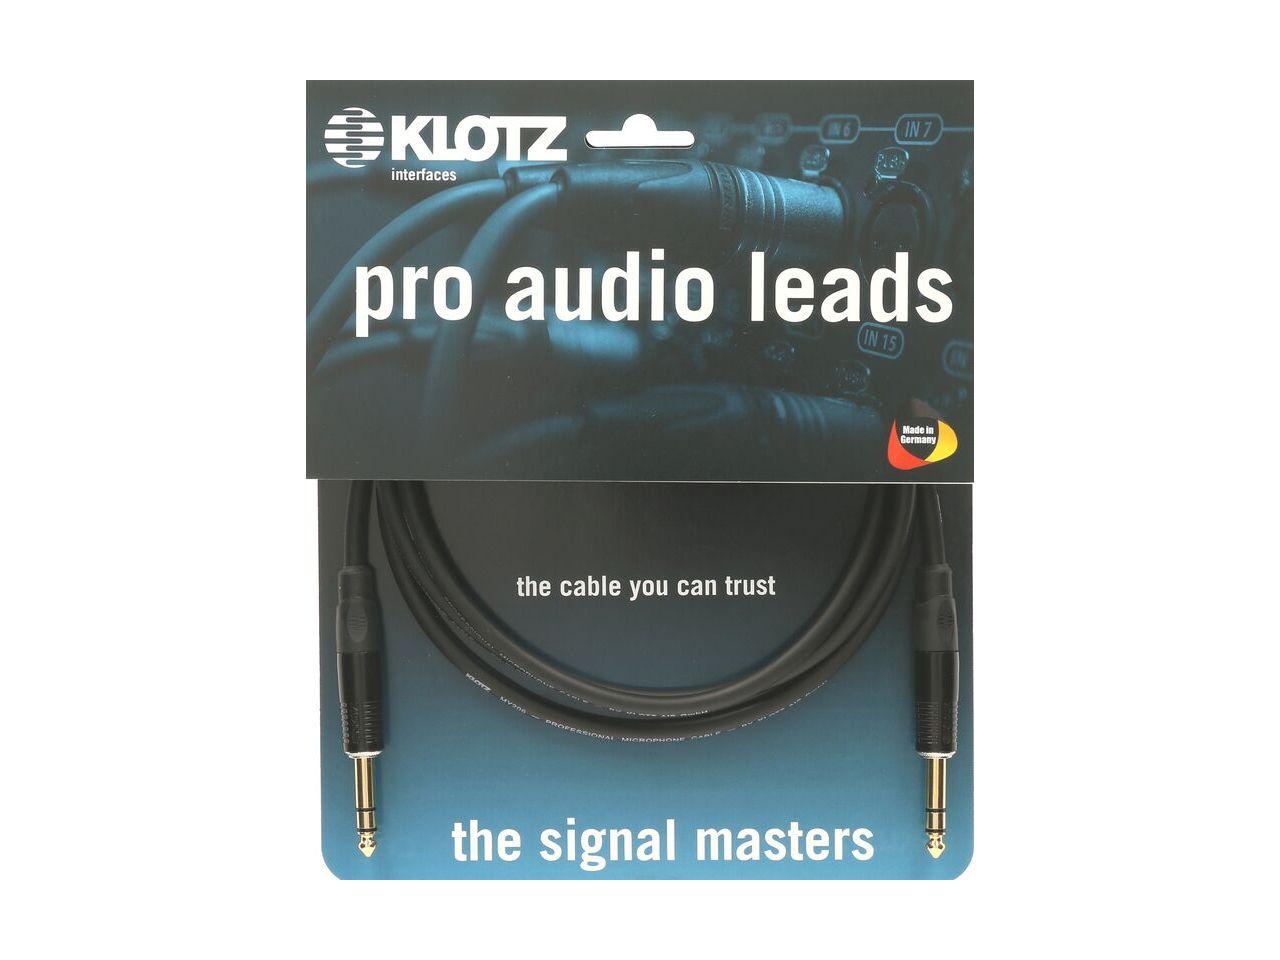 Klotz Kabel 6,3 Klinke Stereo an 6,3 Klinke Stereo 1m